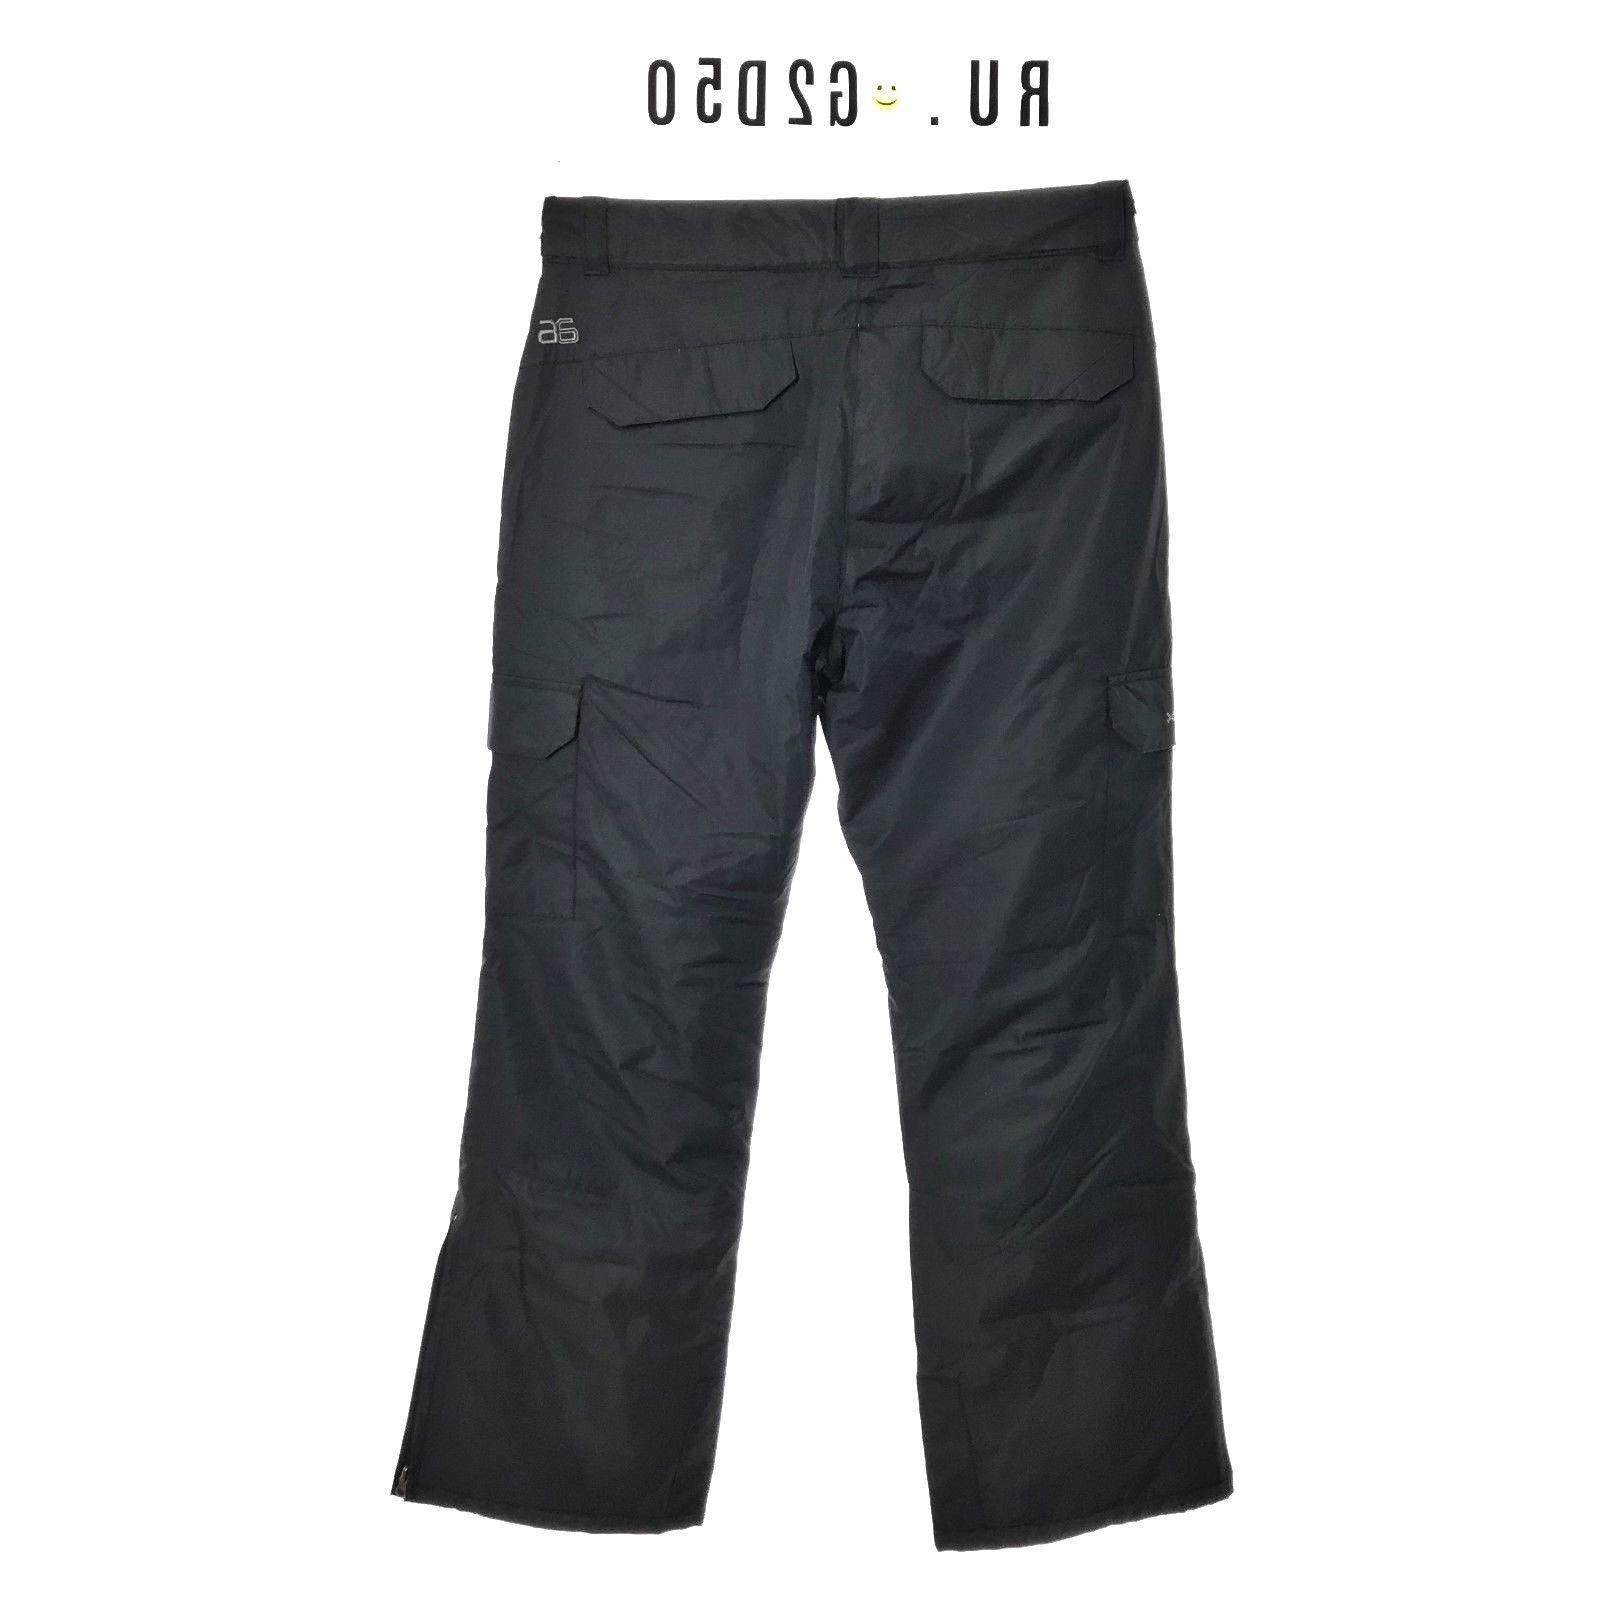 Arctix Cargo Black Pants SZ Medium Snow